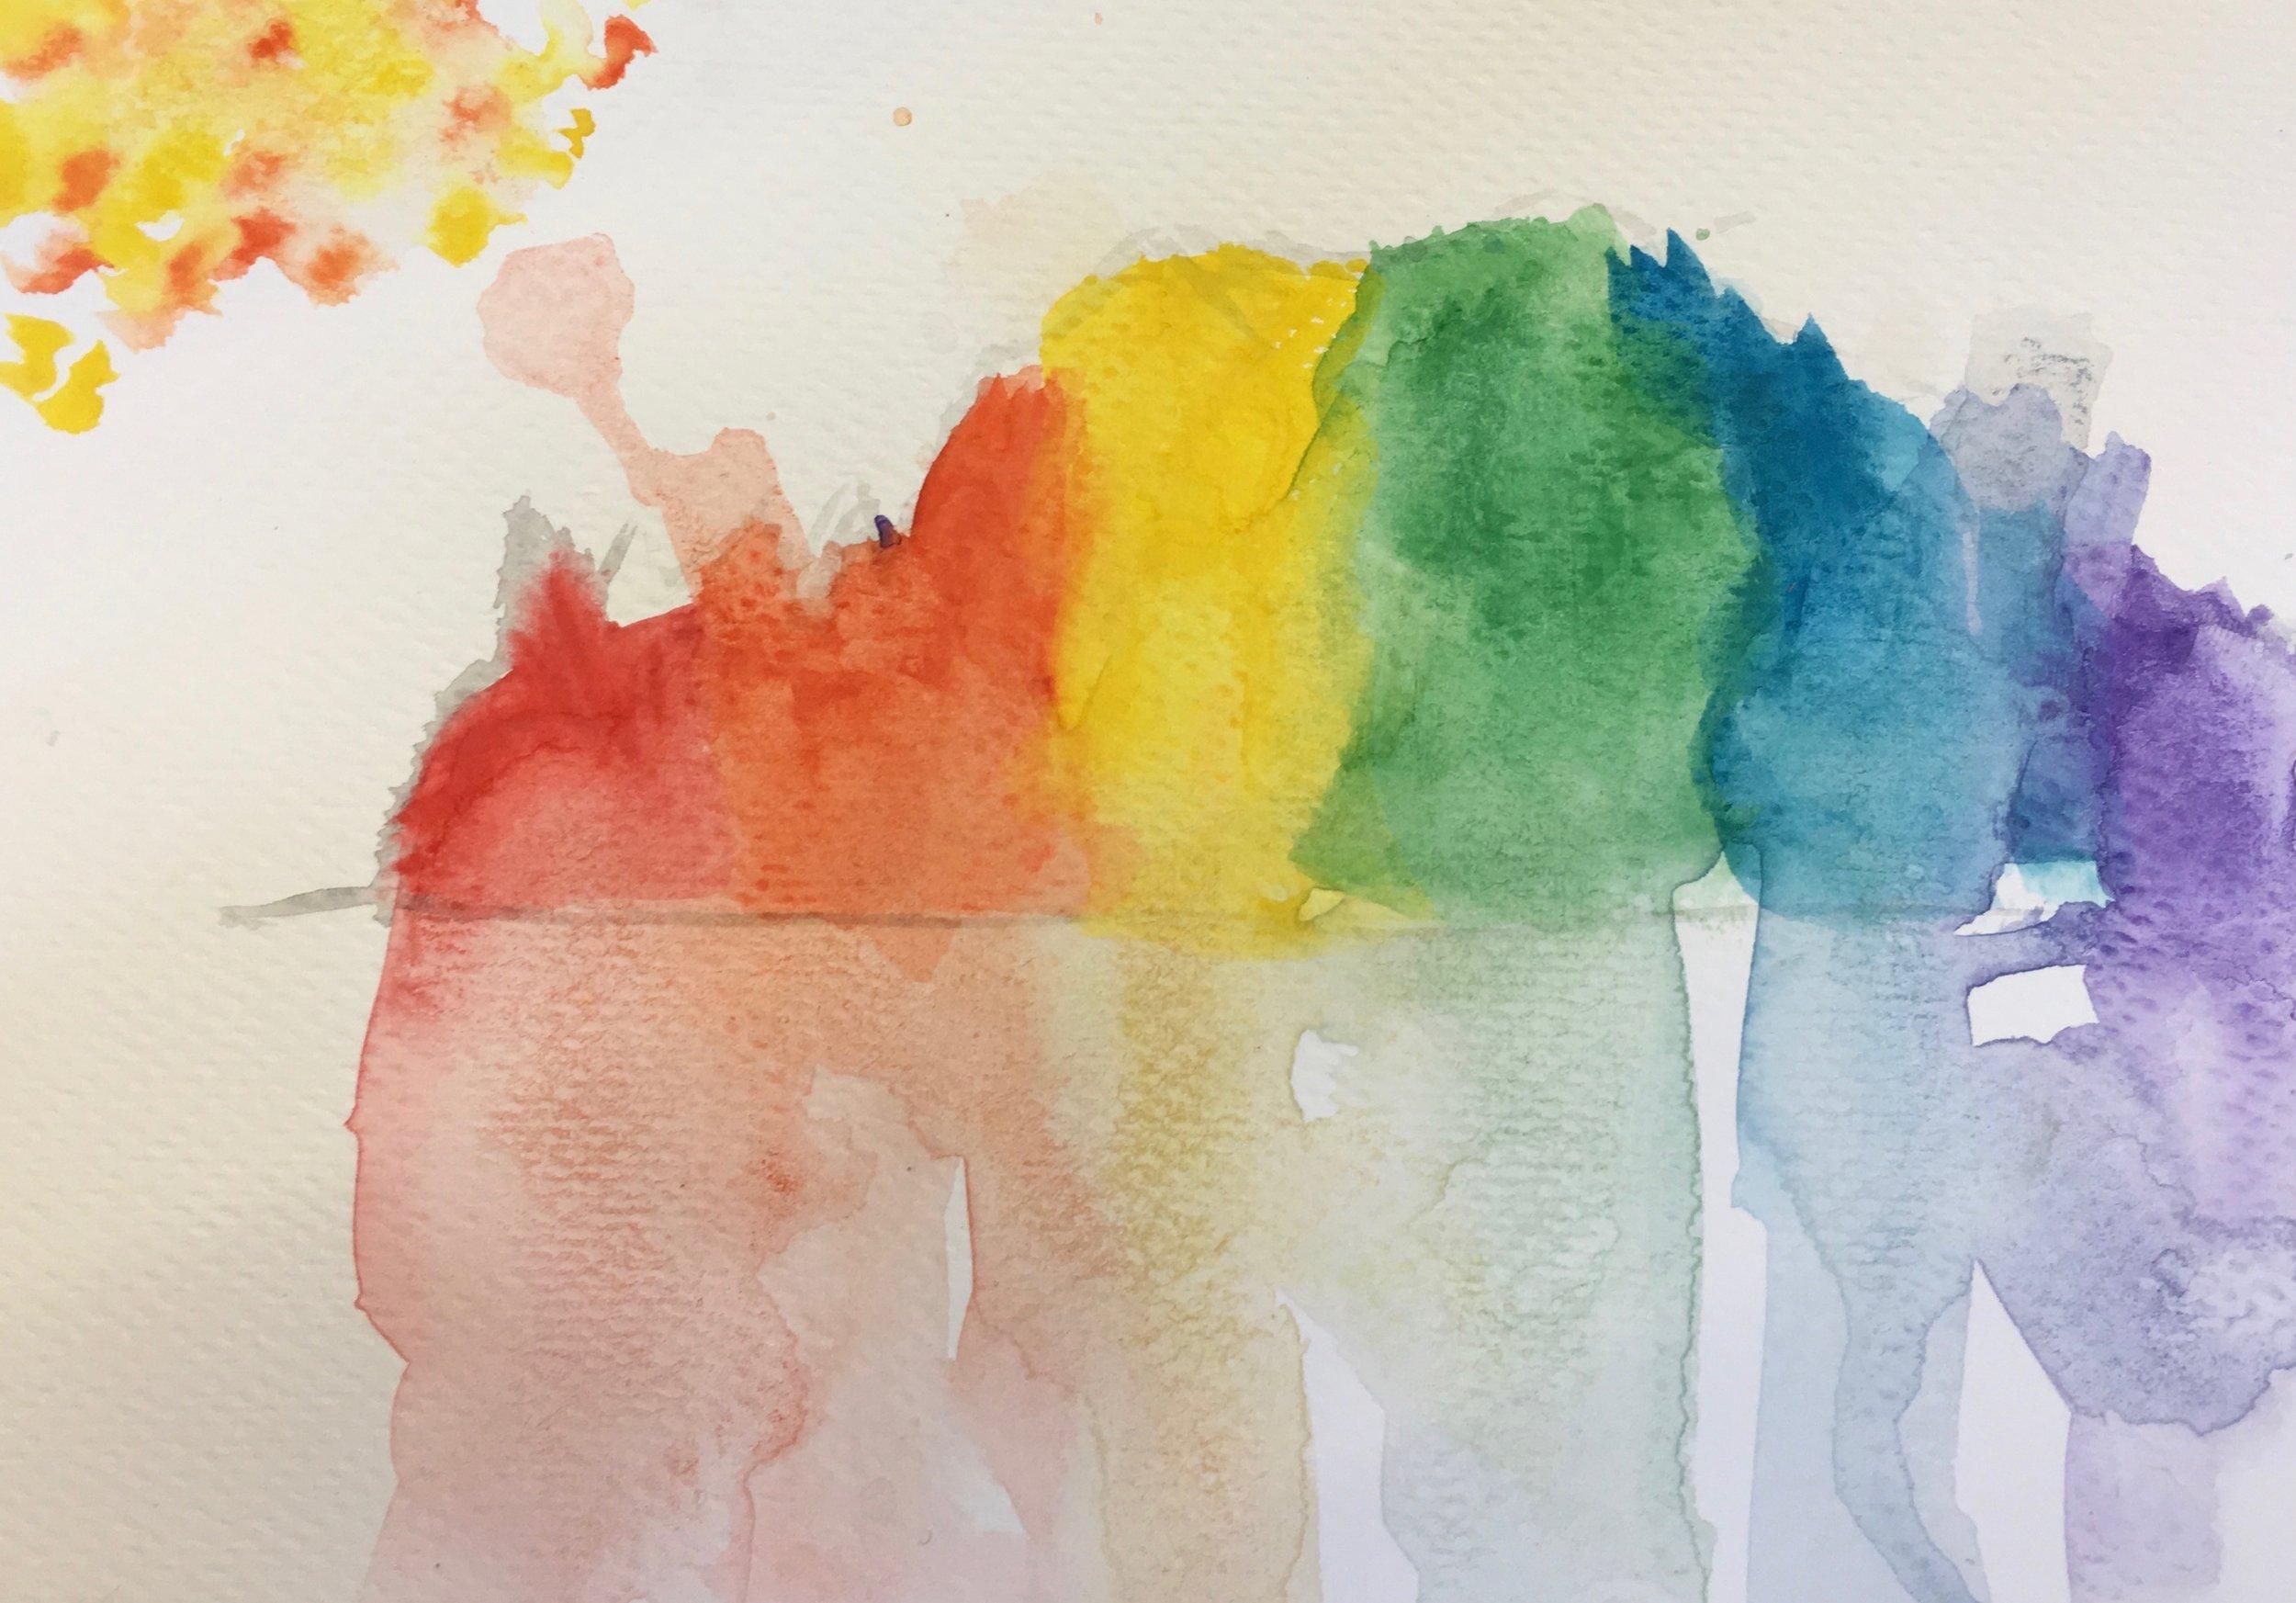 watercolour_session - 1 (1).jpg